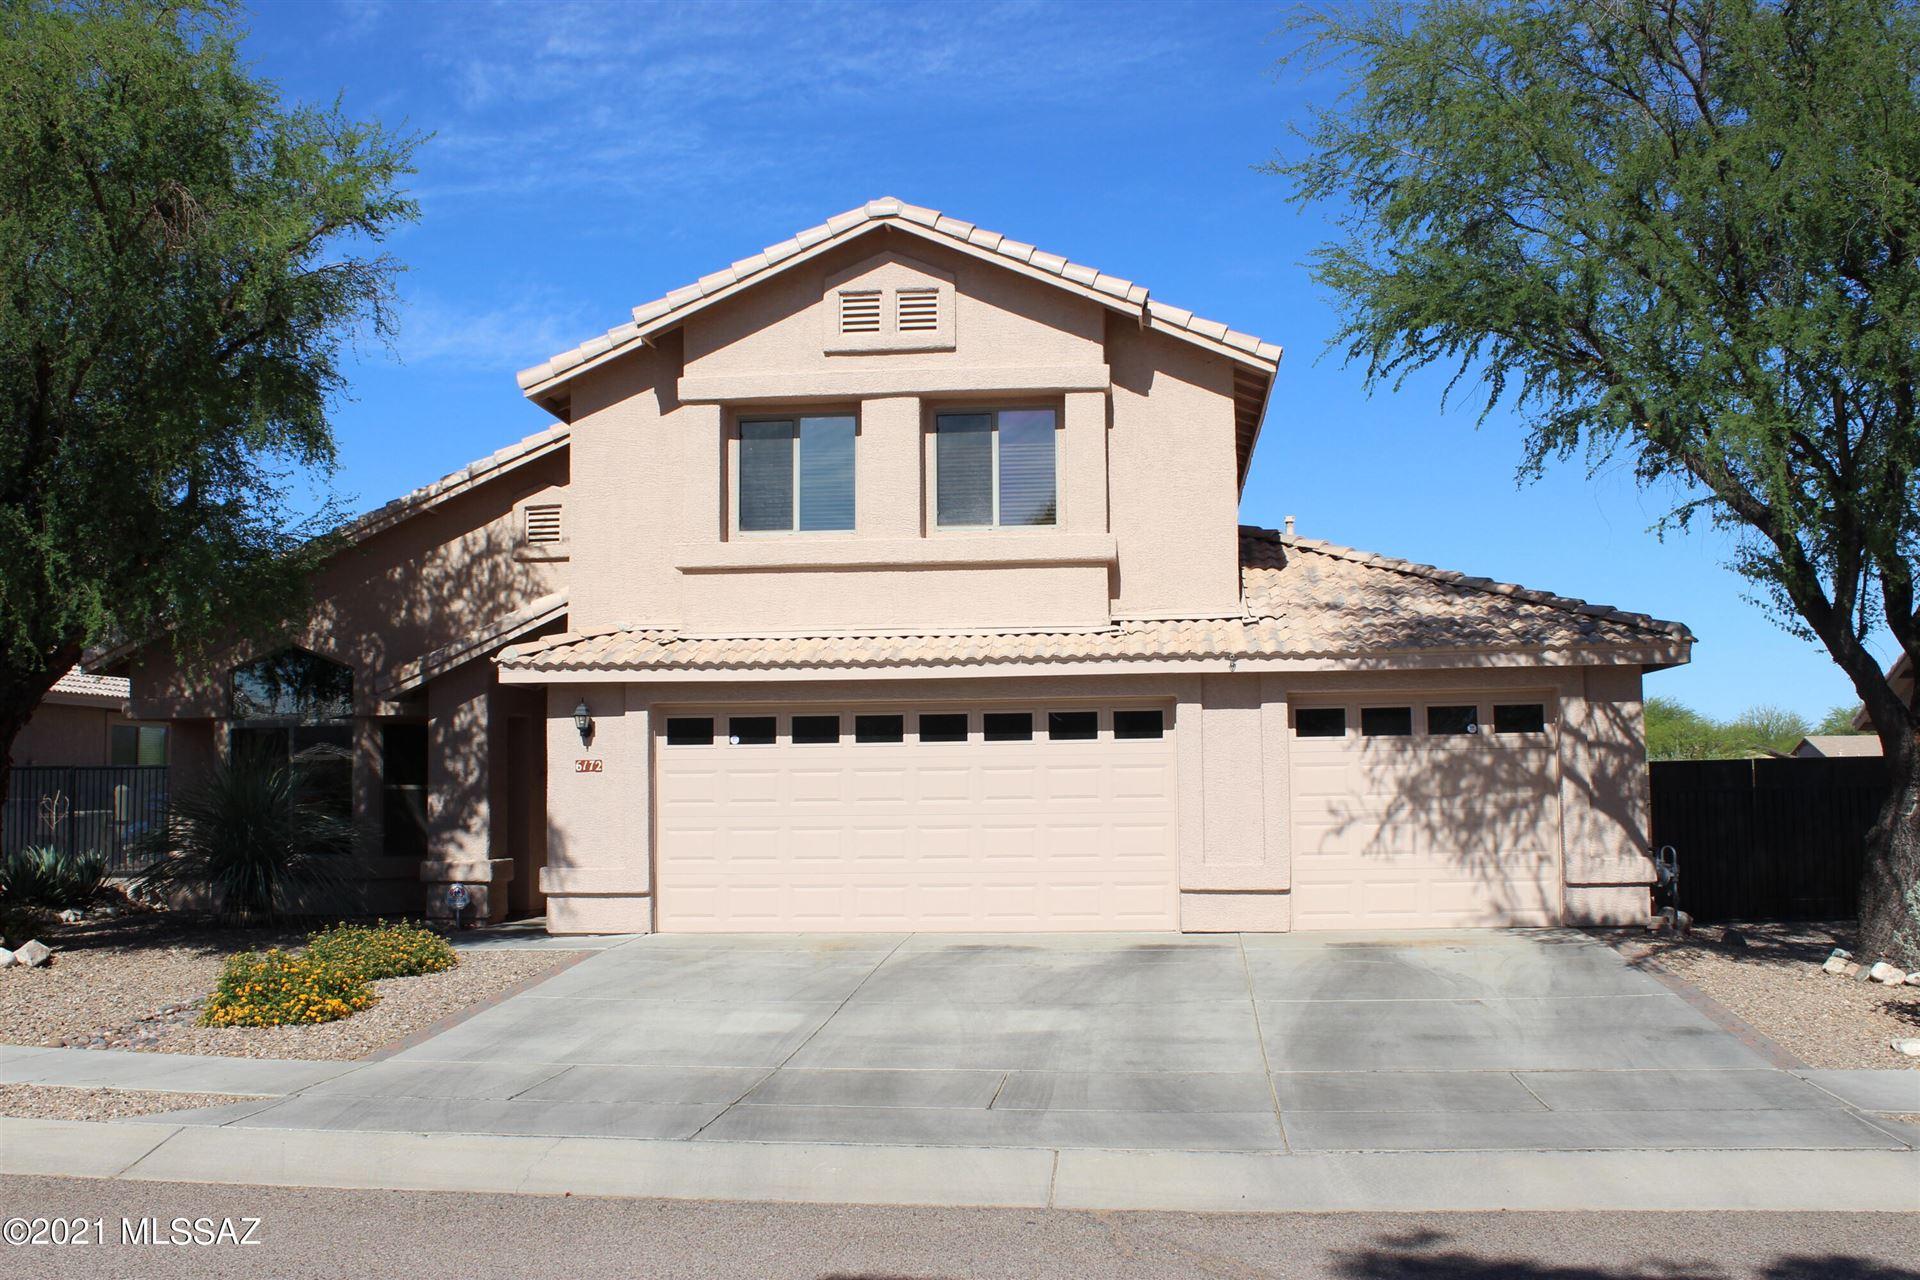 6172 S Lyons Drive, Tucson, AZ 85747 - MLS#: 22112918